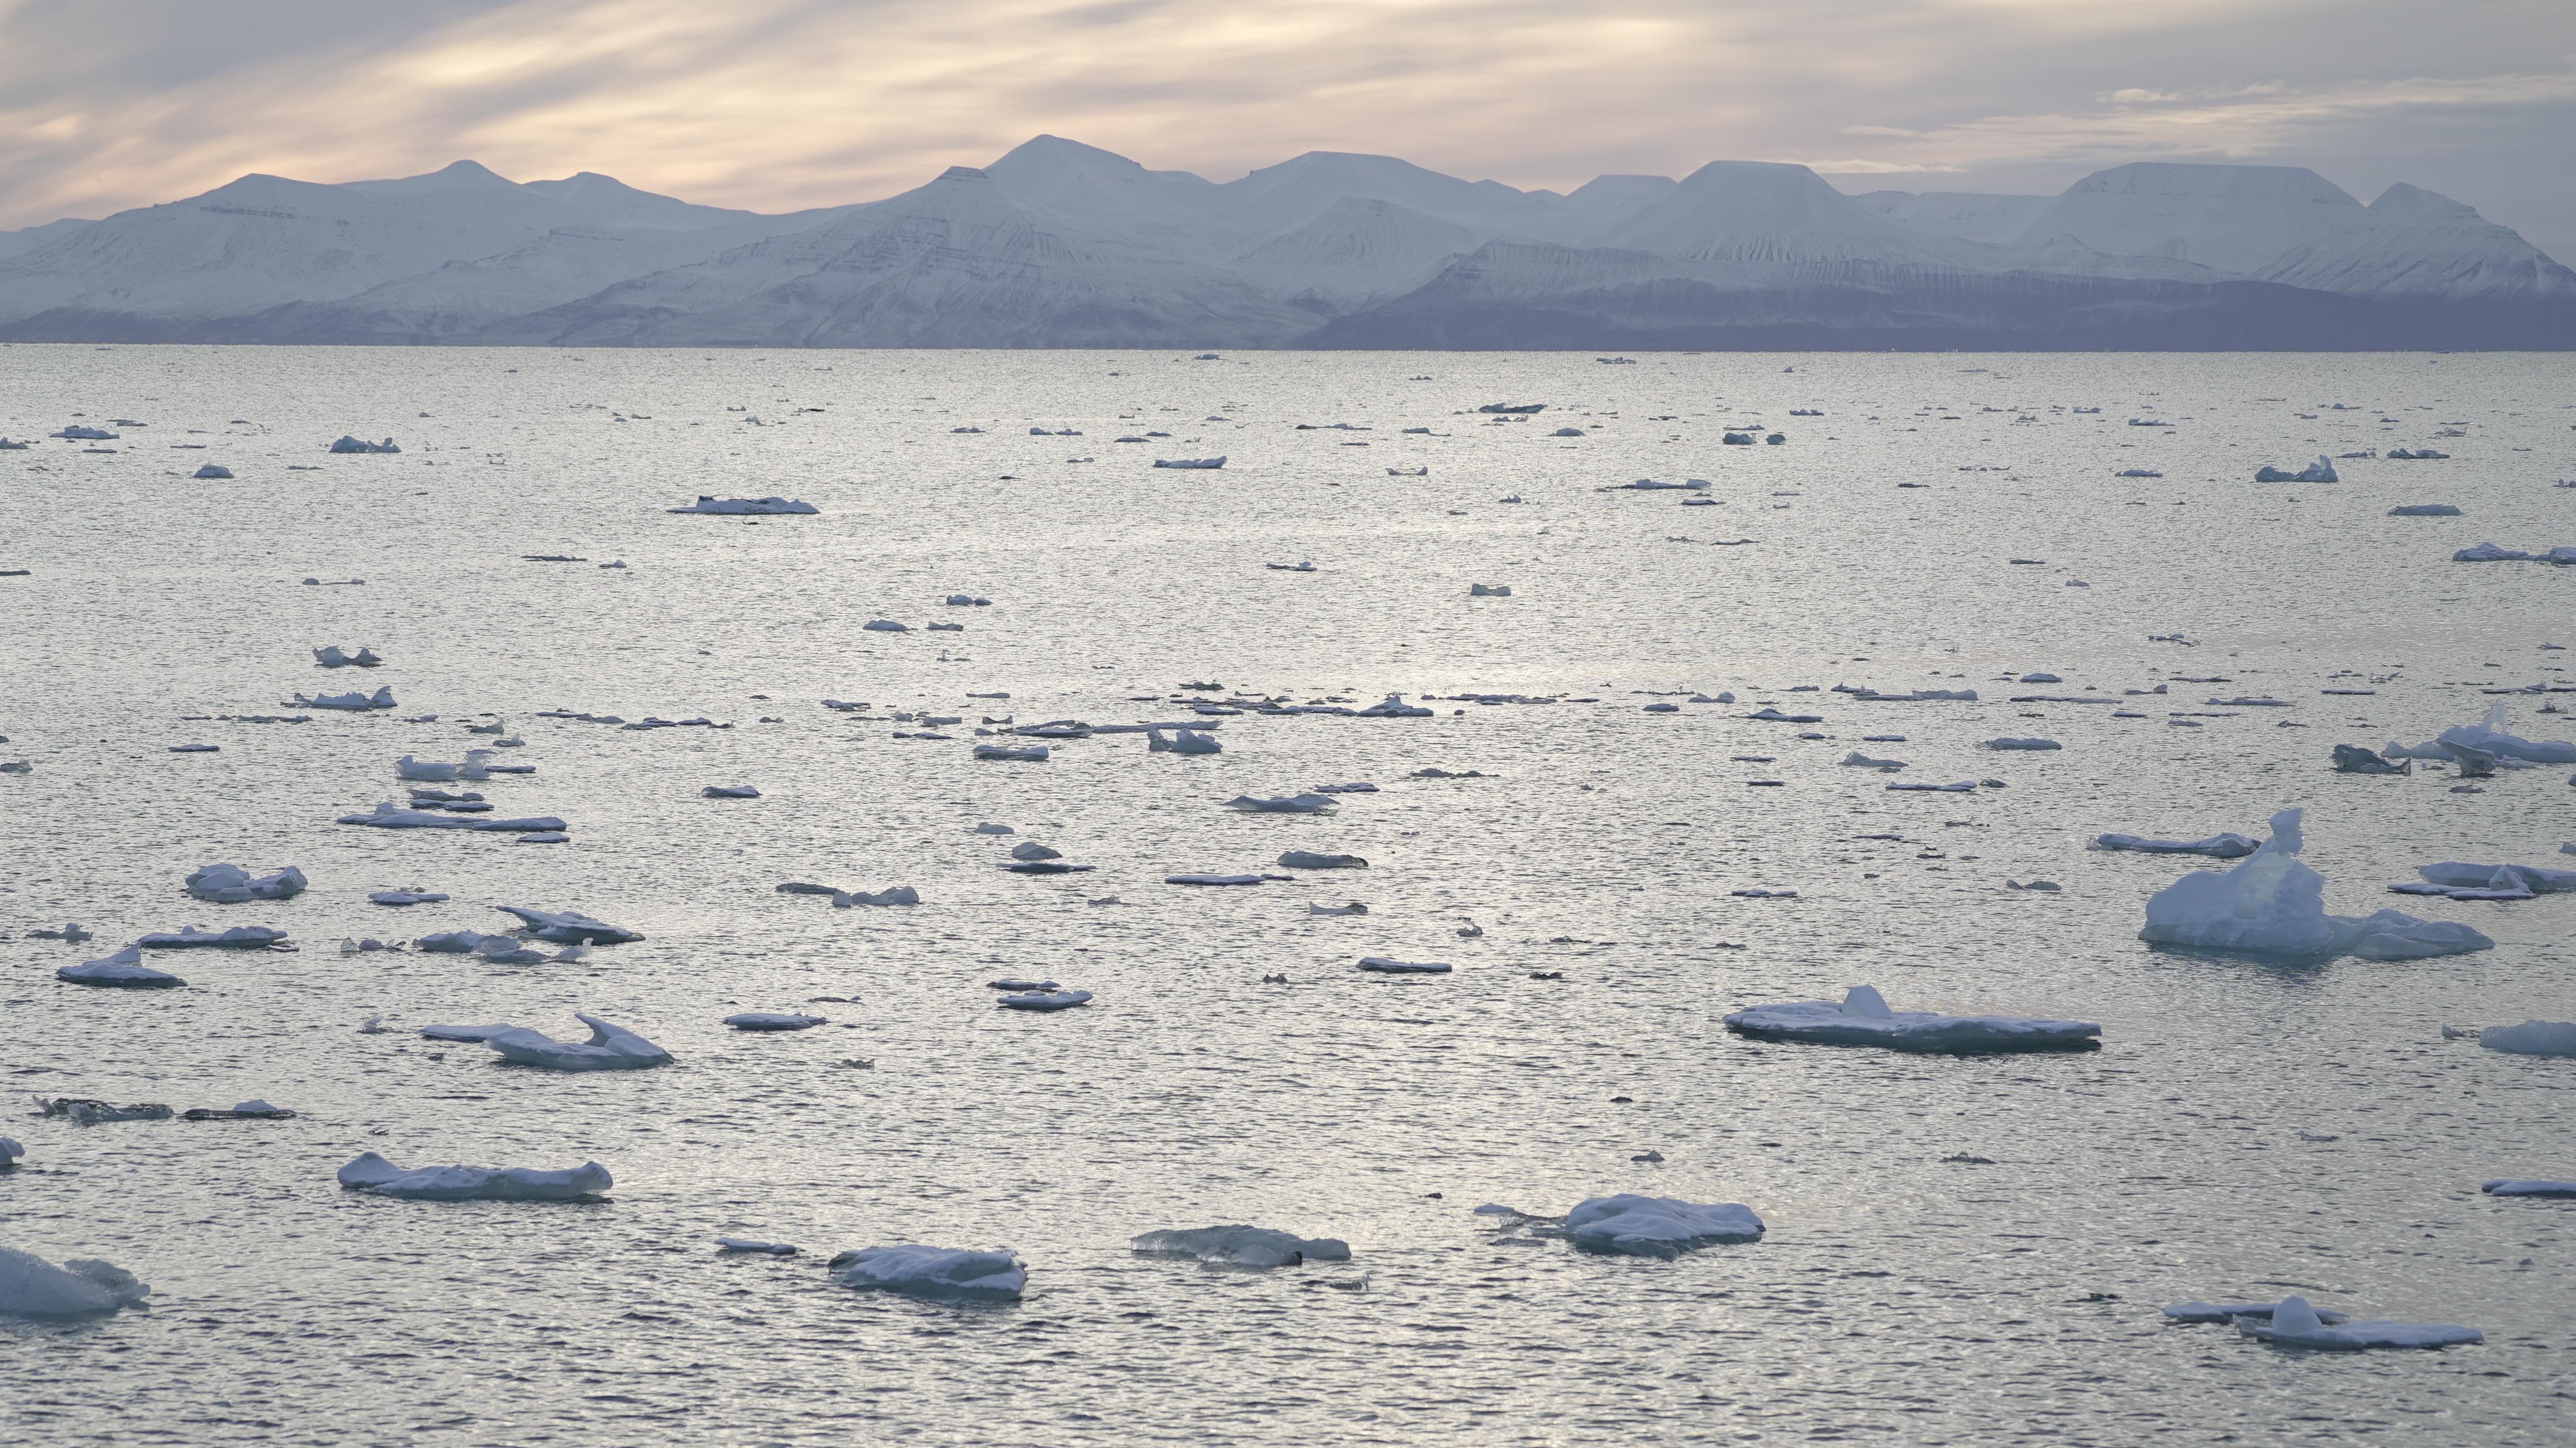 A view across Yoldiabukta Bay towards Spitsbergen island, part of the Svalbard archipelago in northern Norway, September 27, 2020. REUTERS/Natalie Thomas